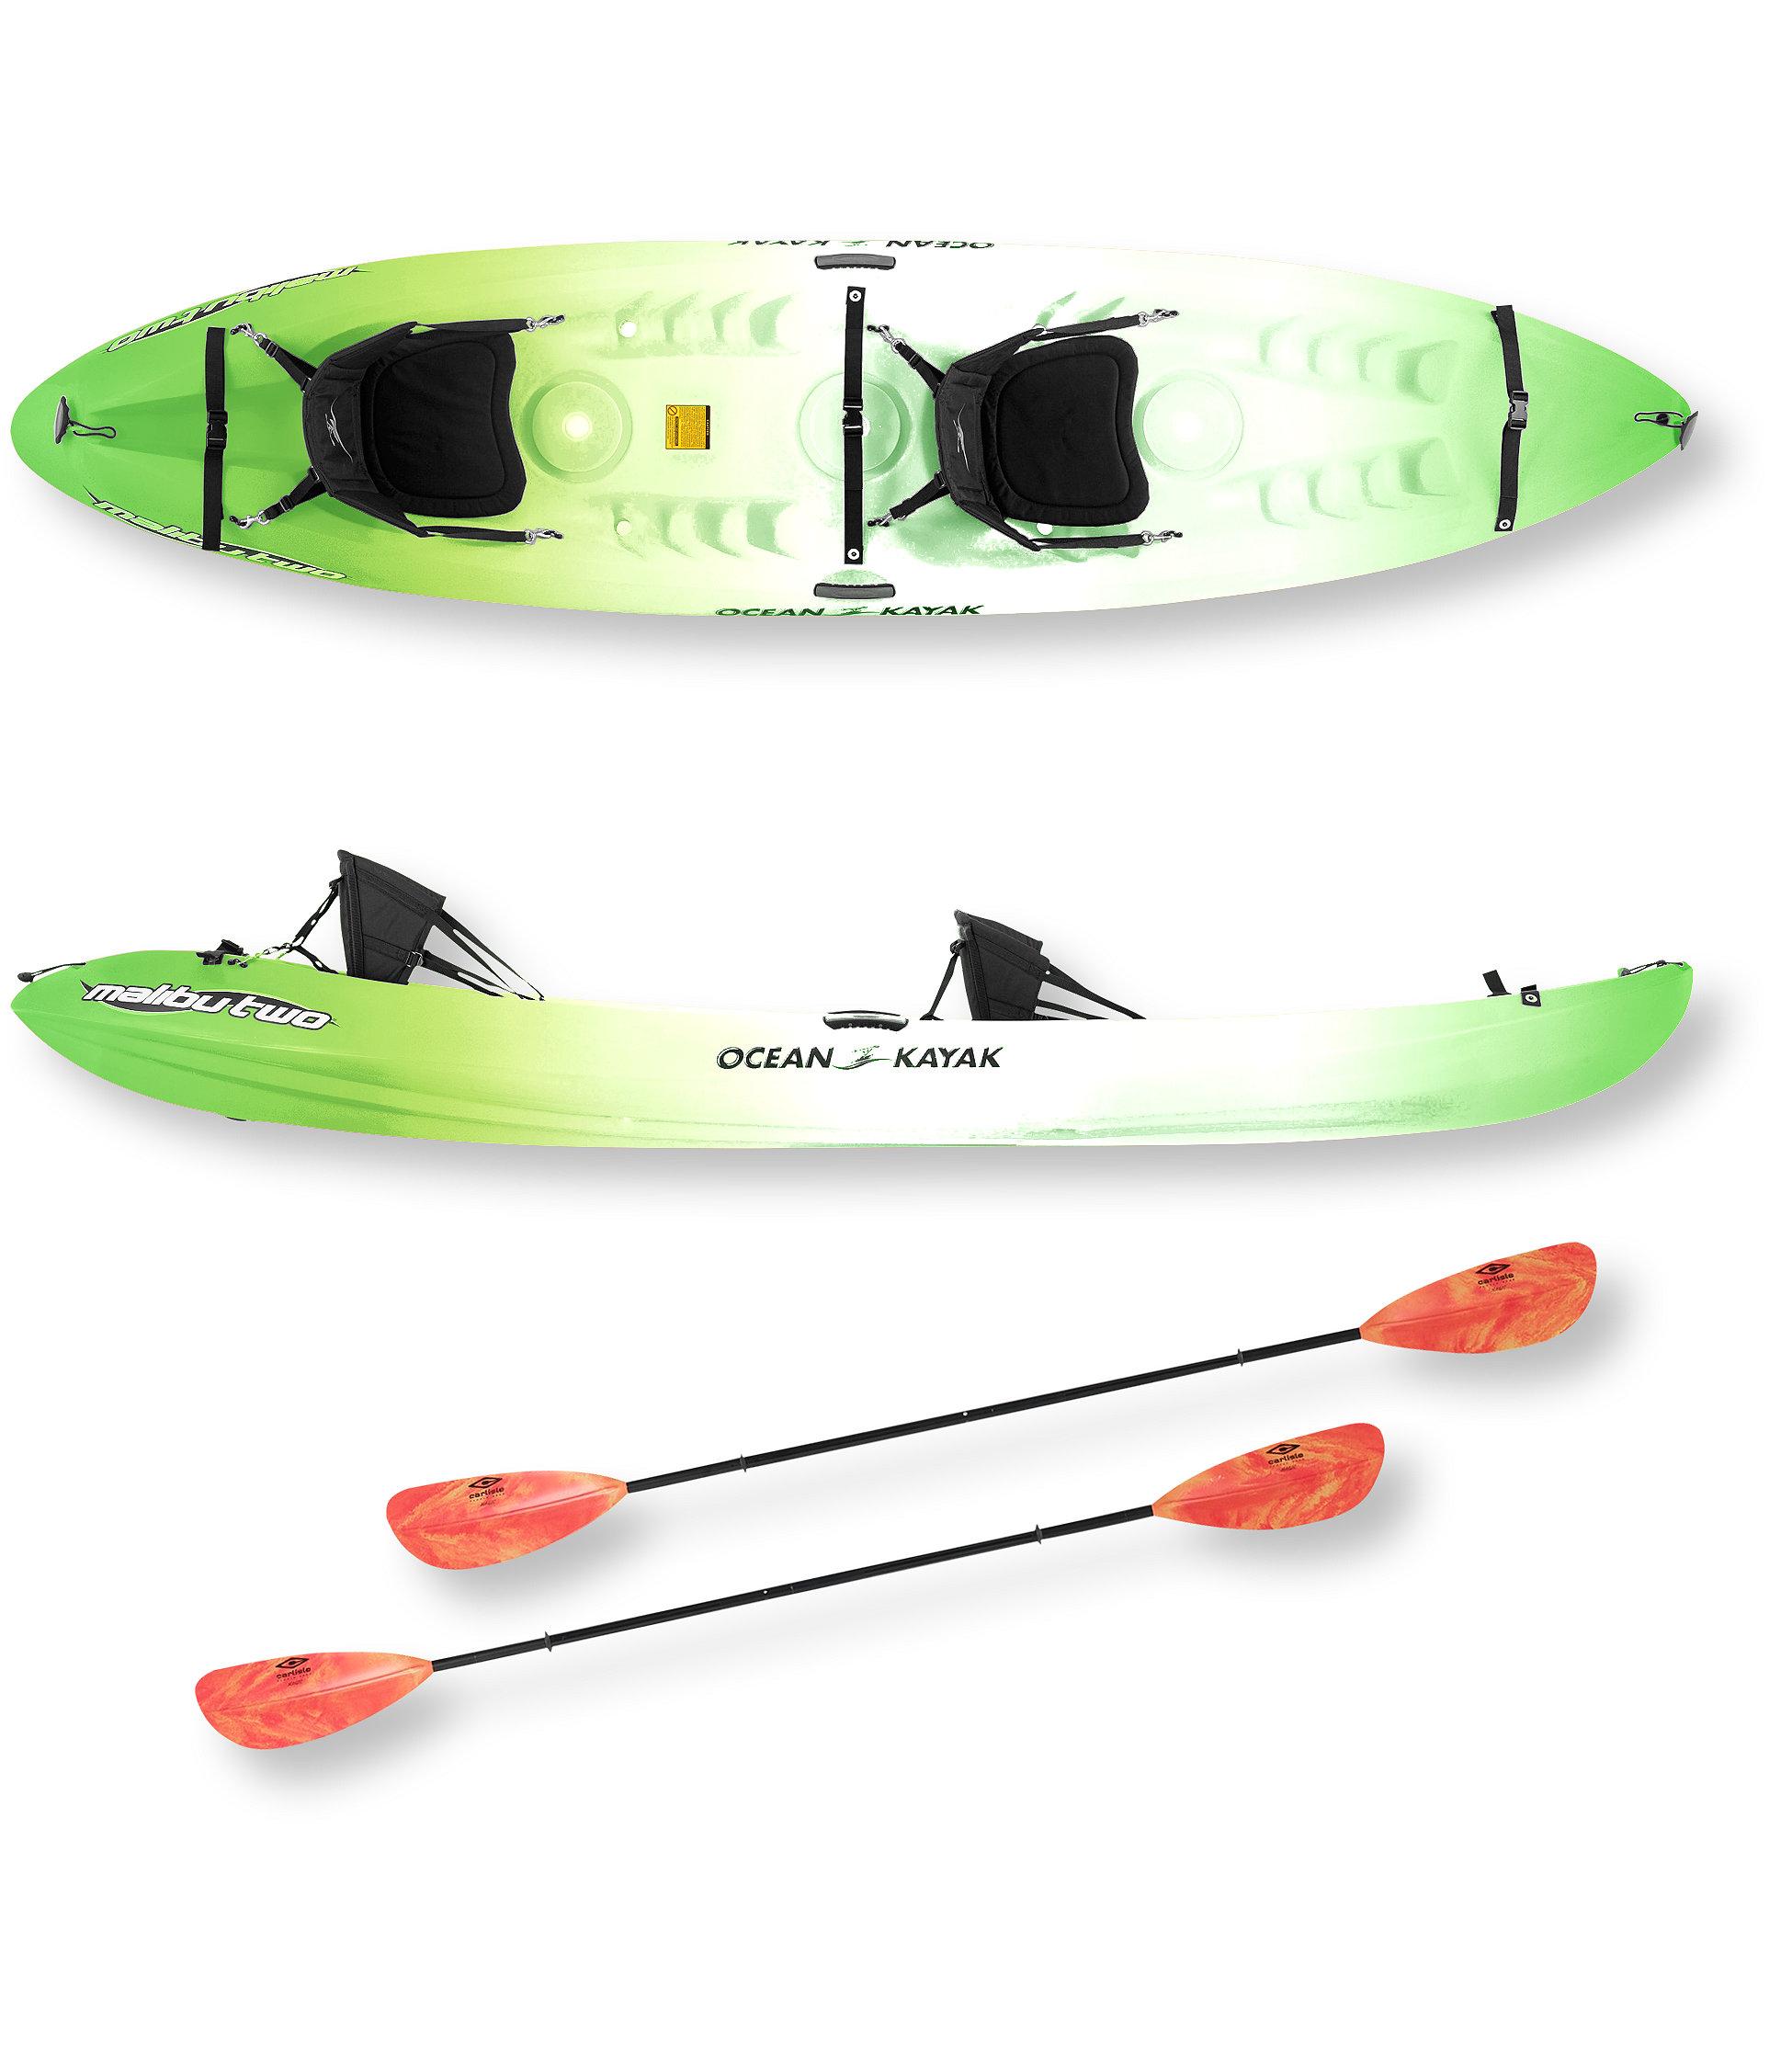 photo of a Ocean Kayak sit-on-top kayak